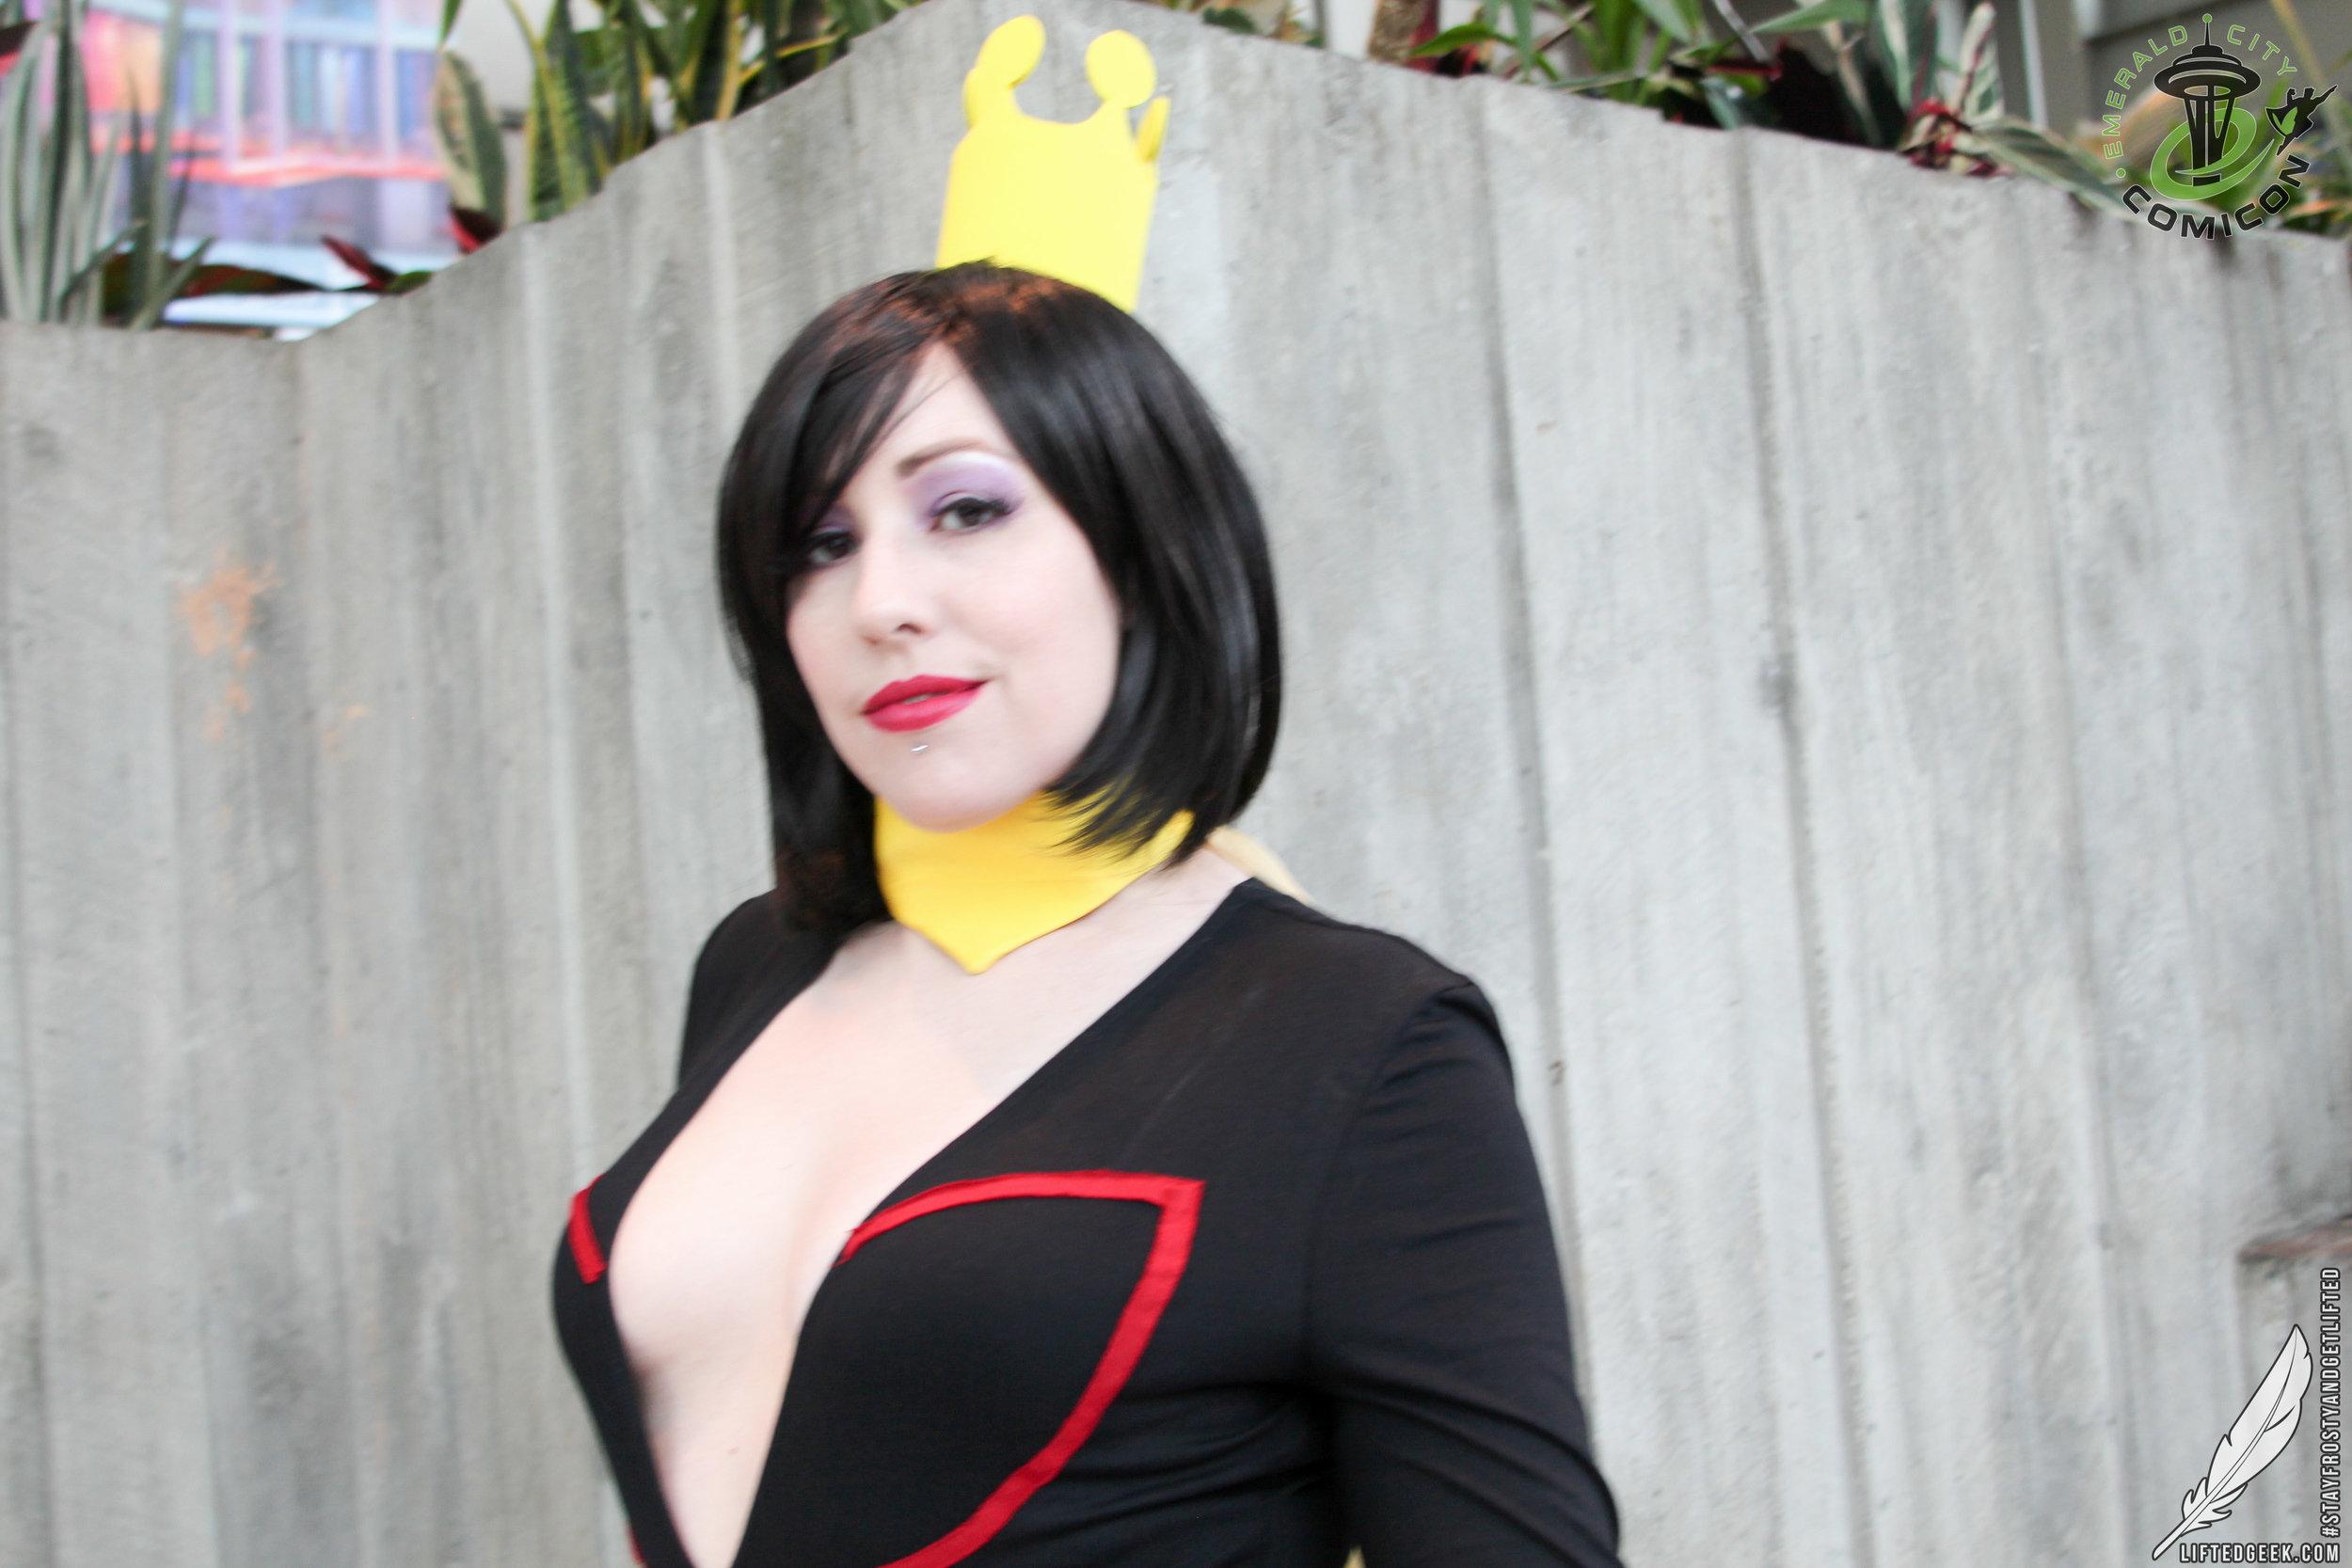 ECCC2018-cosplay-71.jpg